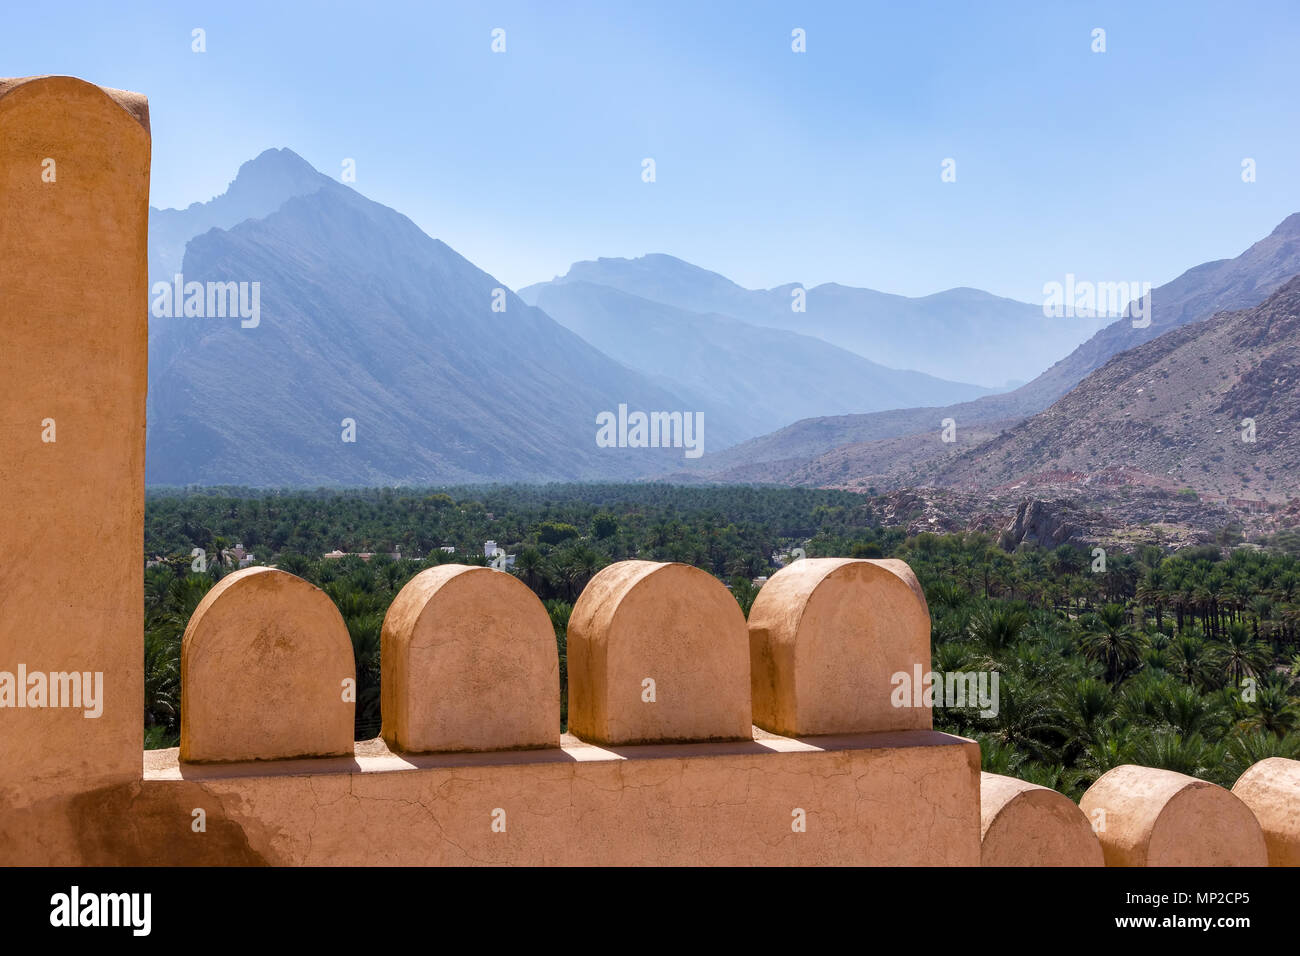 Le Fort Nakhl, Oman Photo Stock